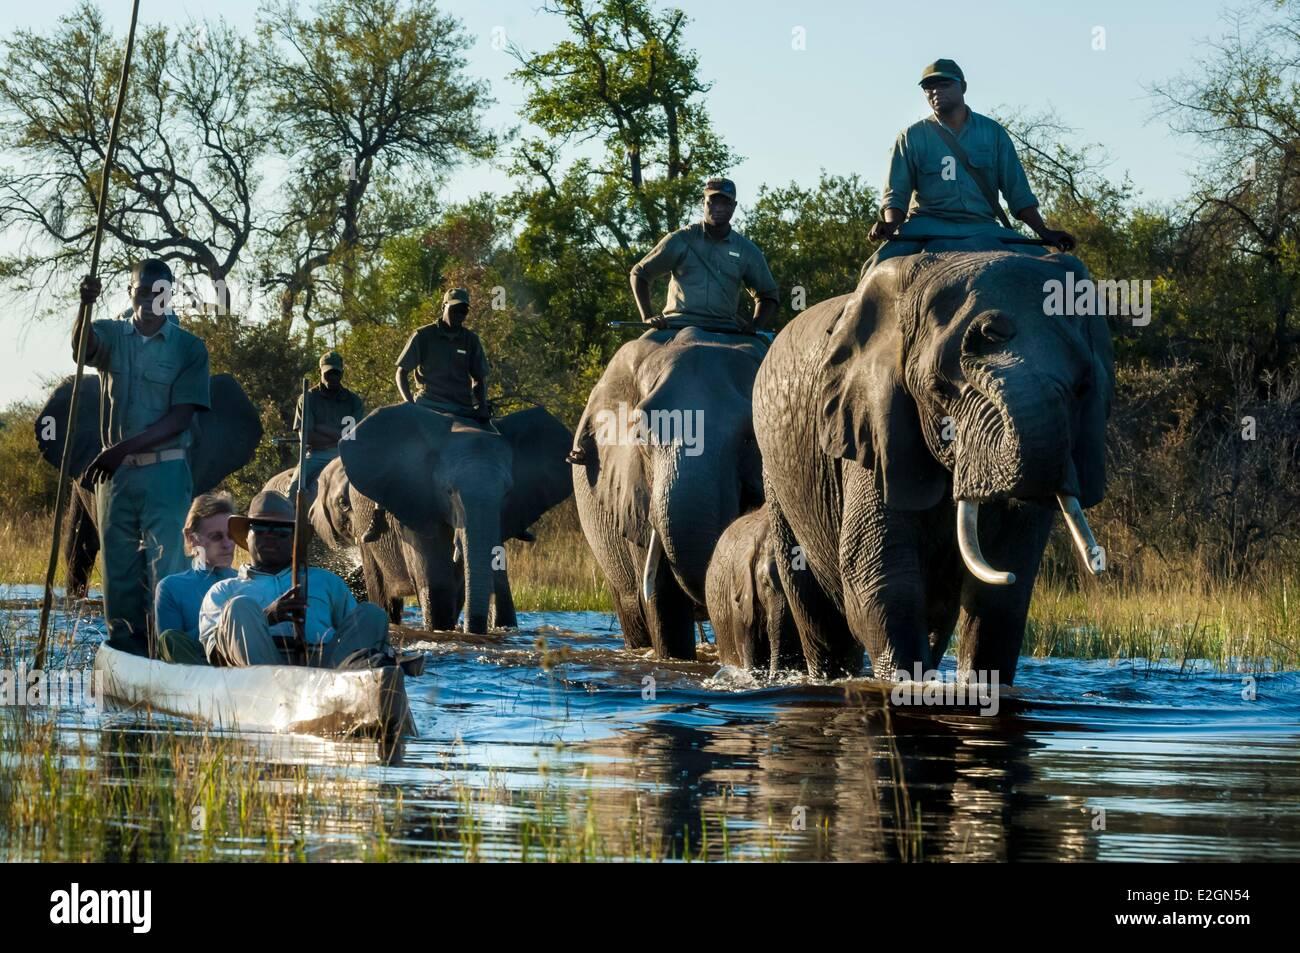 Botswana North West District Okavango Delta Abu Lodge safari on elephant back and by canoe - Stock Image